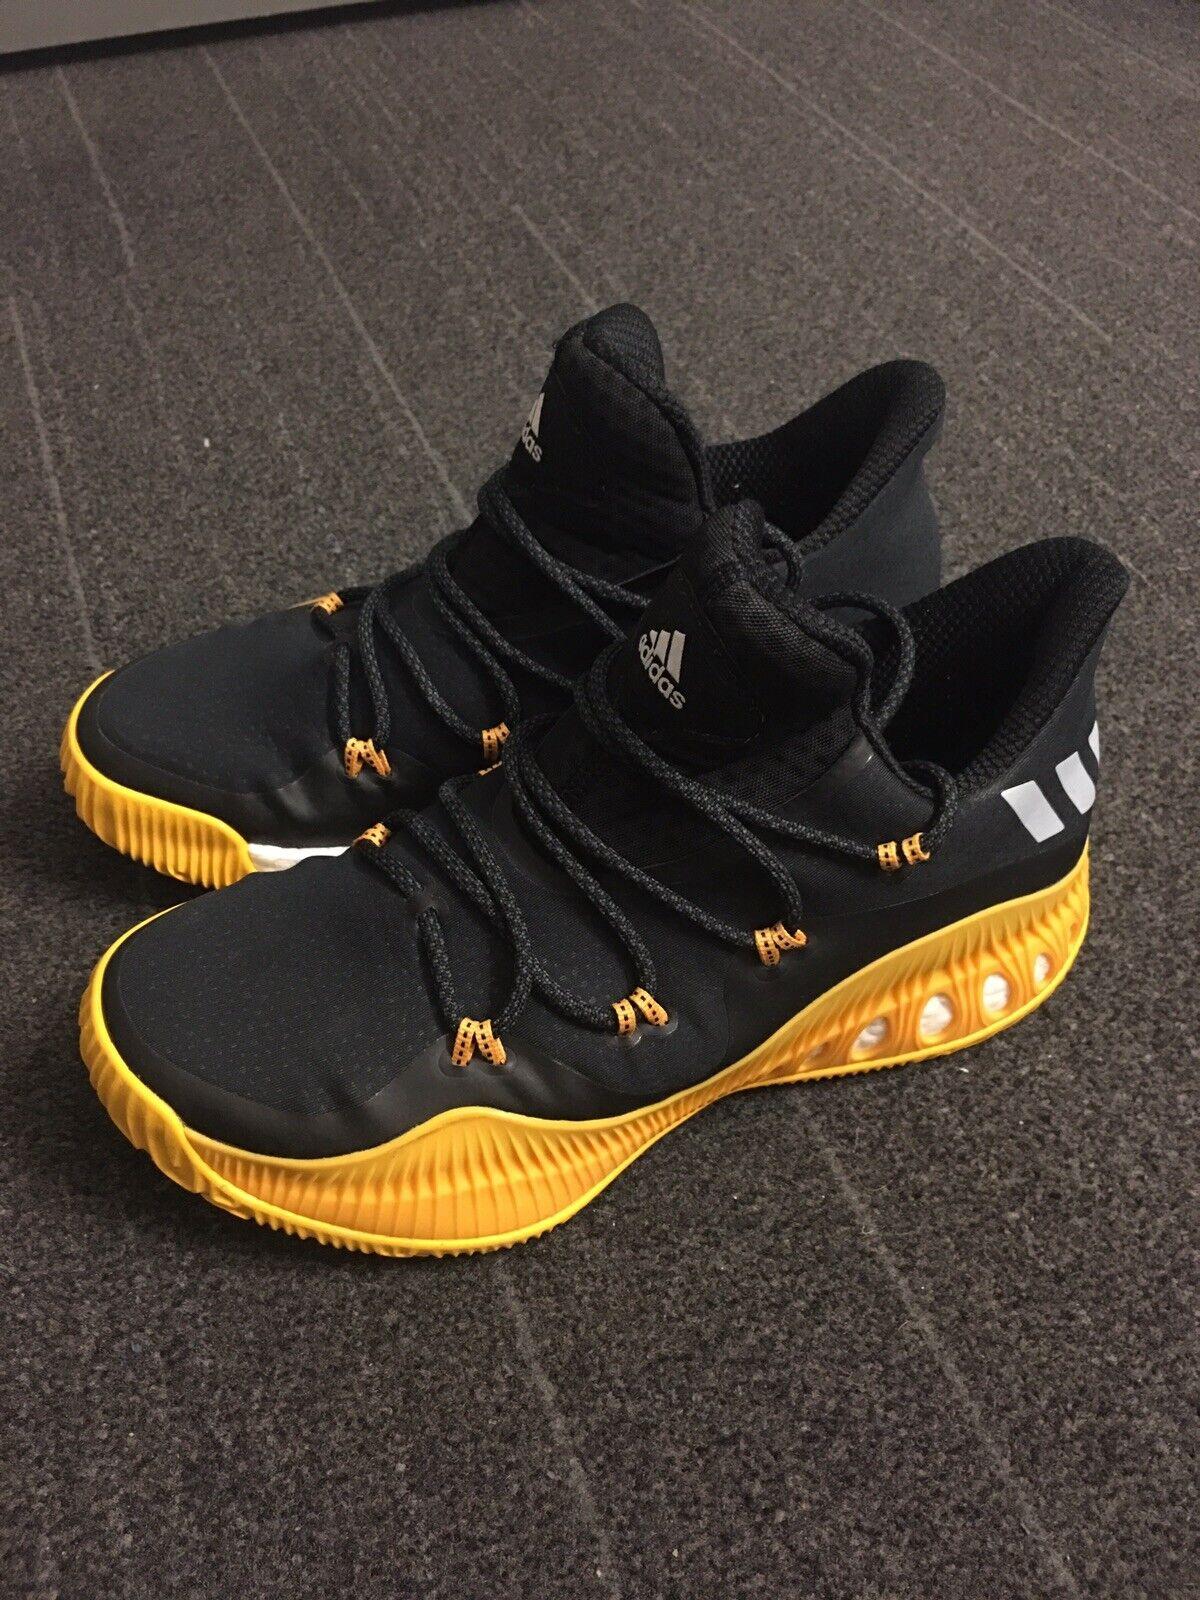 Adidas Crazy Explosive Low Lakers Sz 8.5